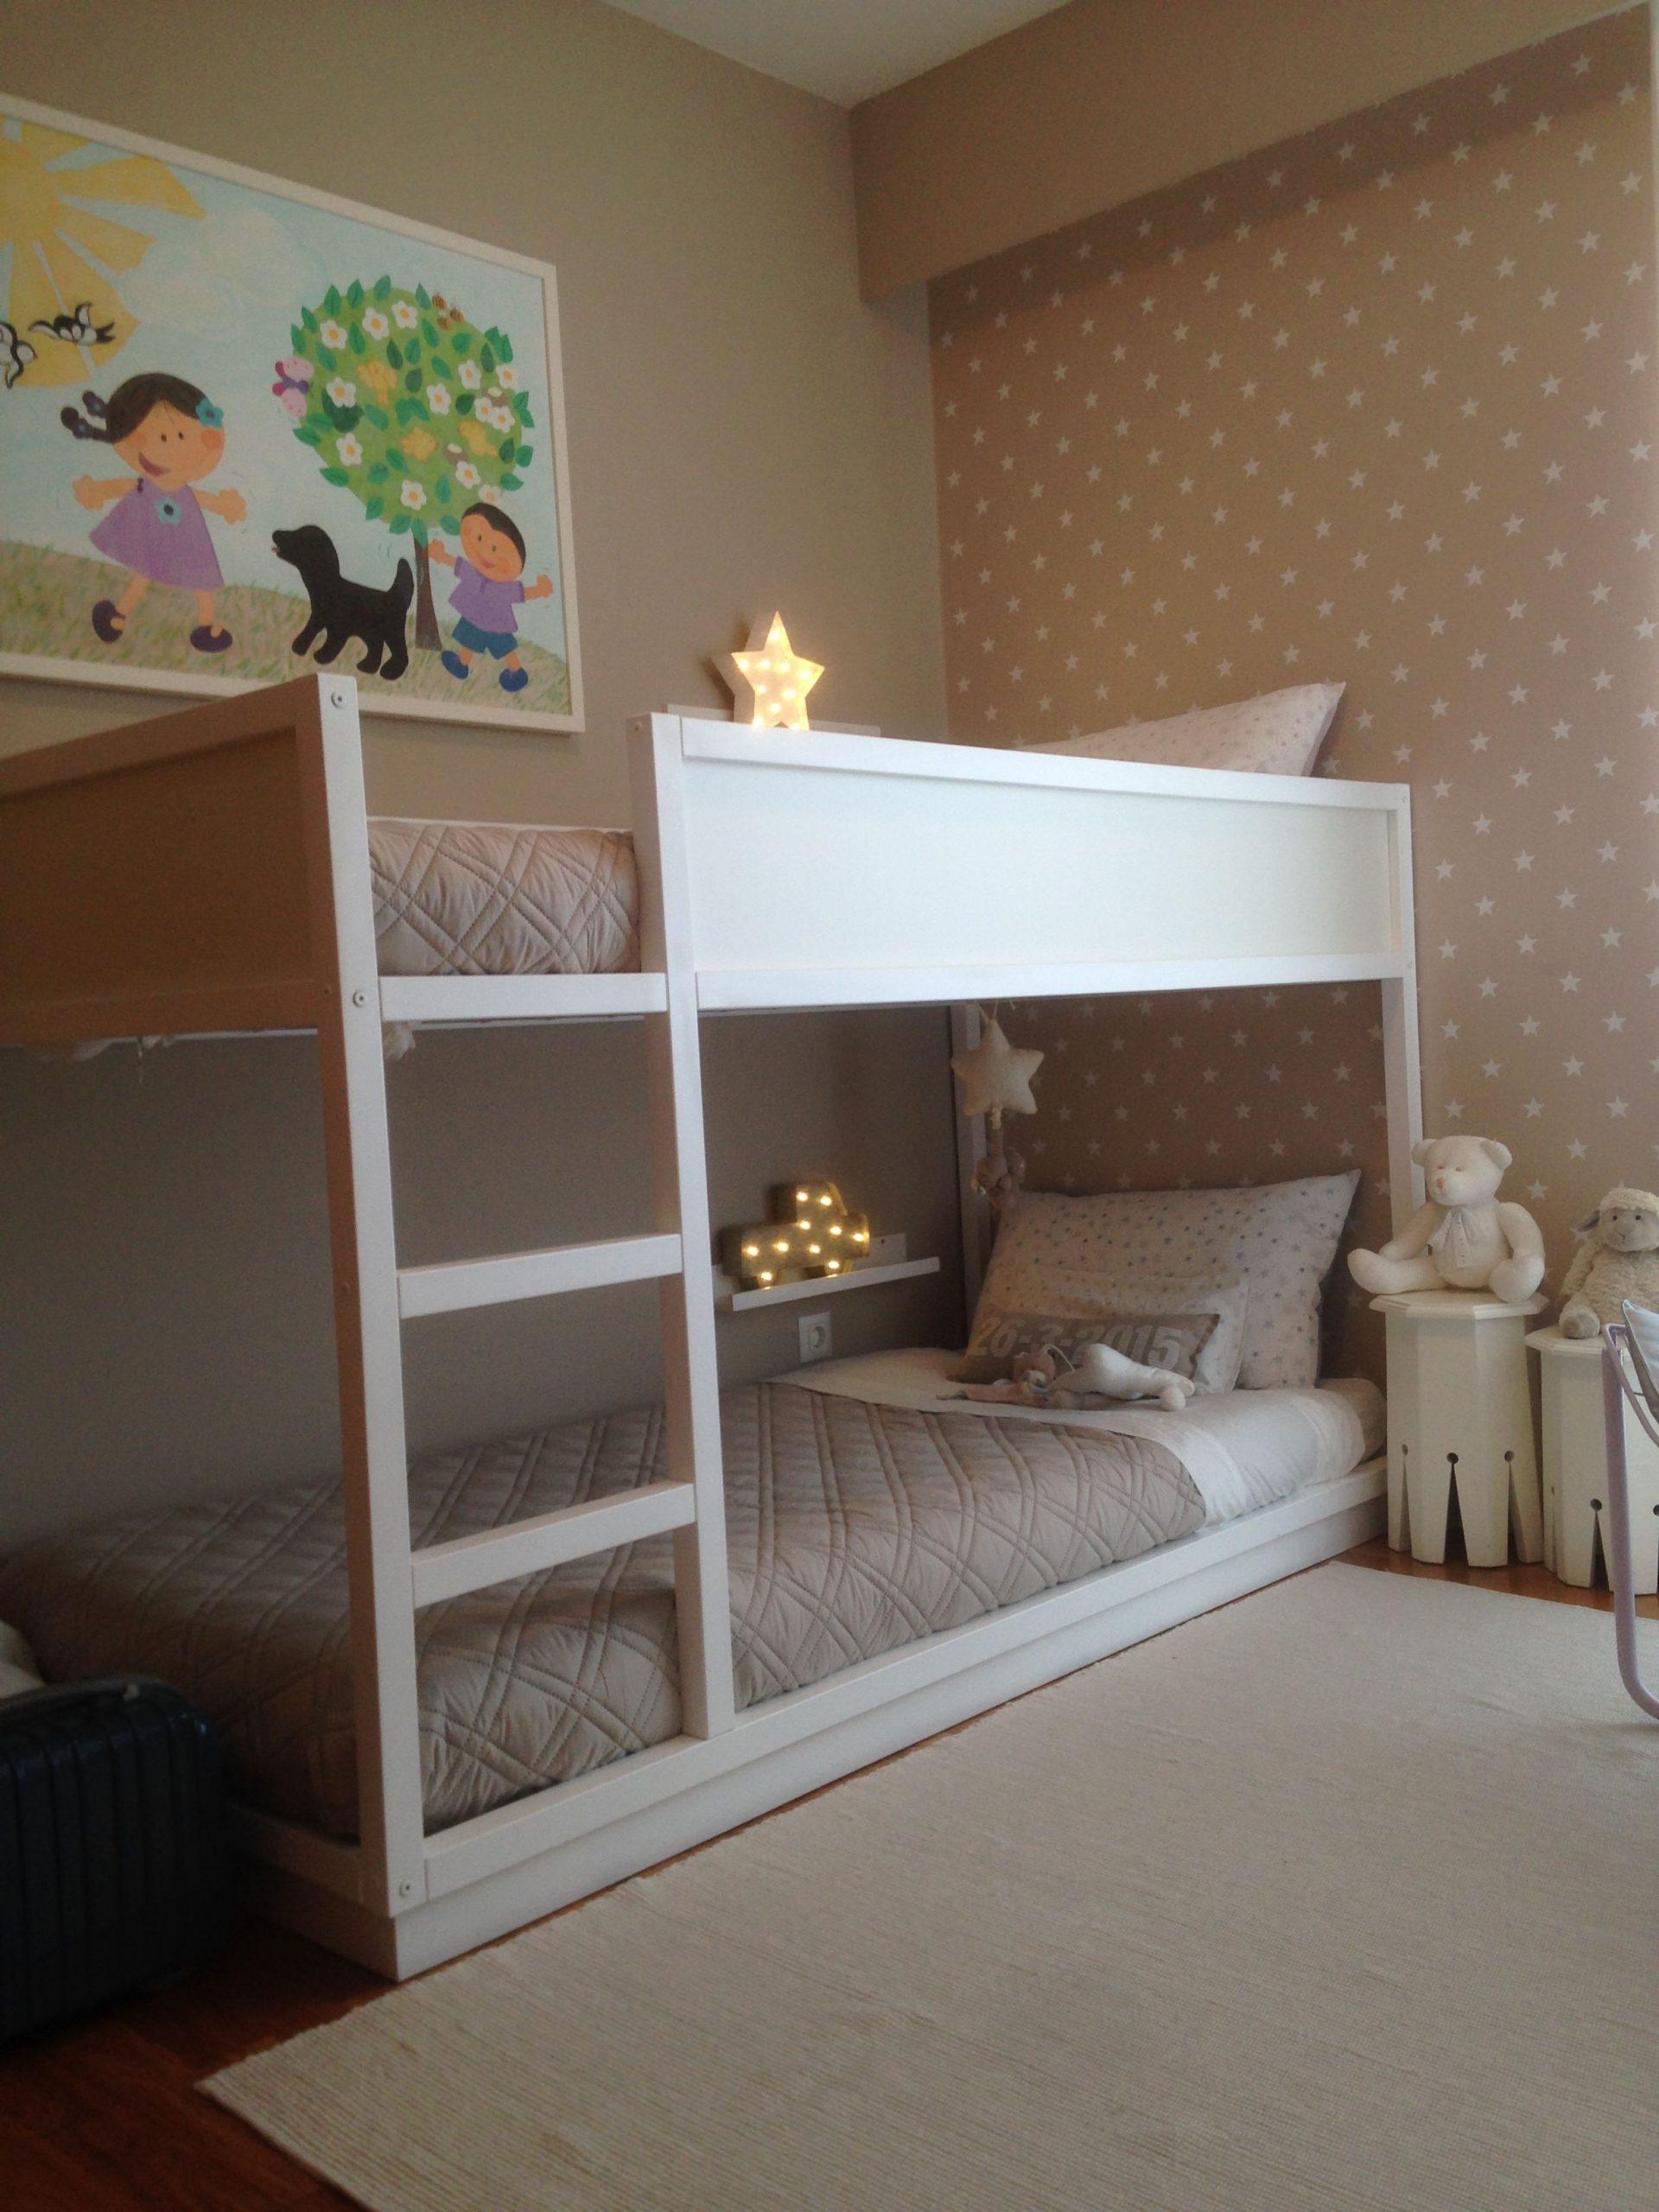 Full Size of Ikea Bett Kura Bed Hack Kinderzimmer Cars 140 Bette Floor Wohnzimmer Kura Hack